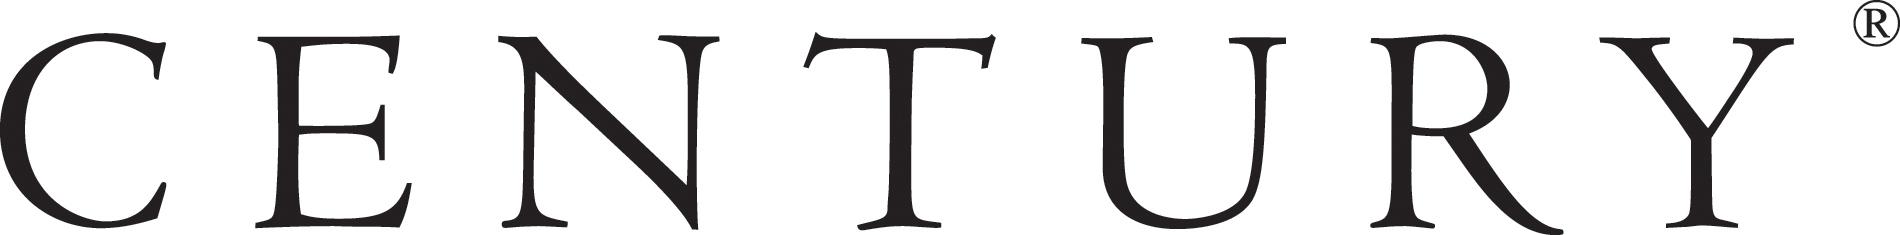 Century Reg_Font Logo POS.jpg